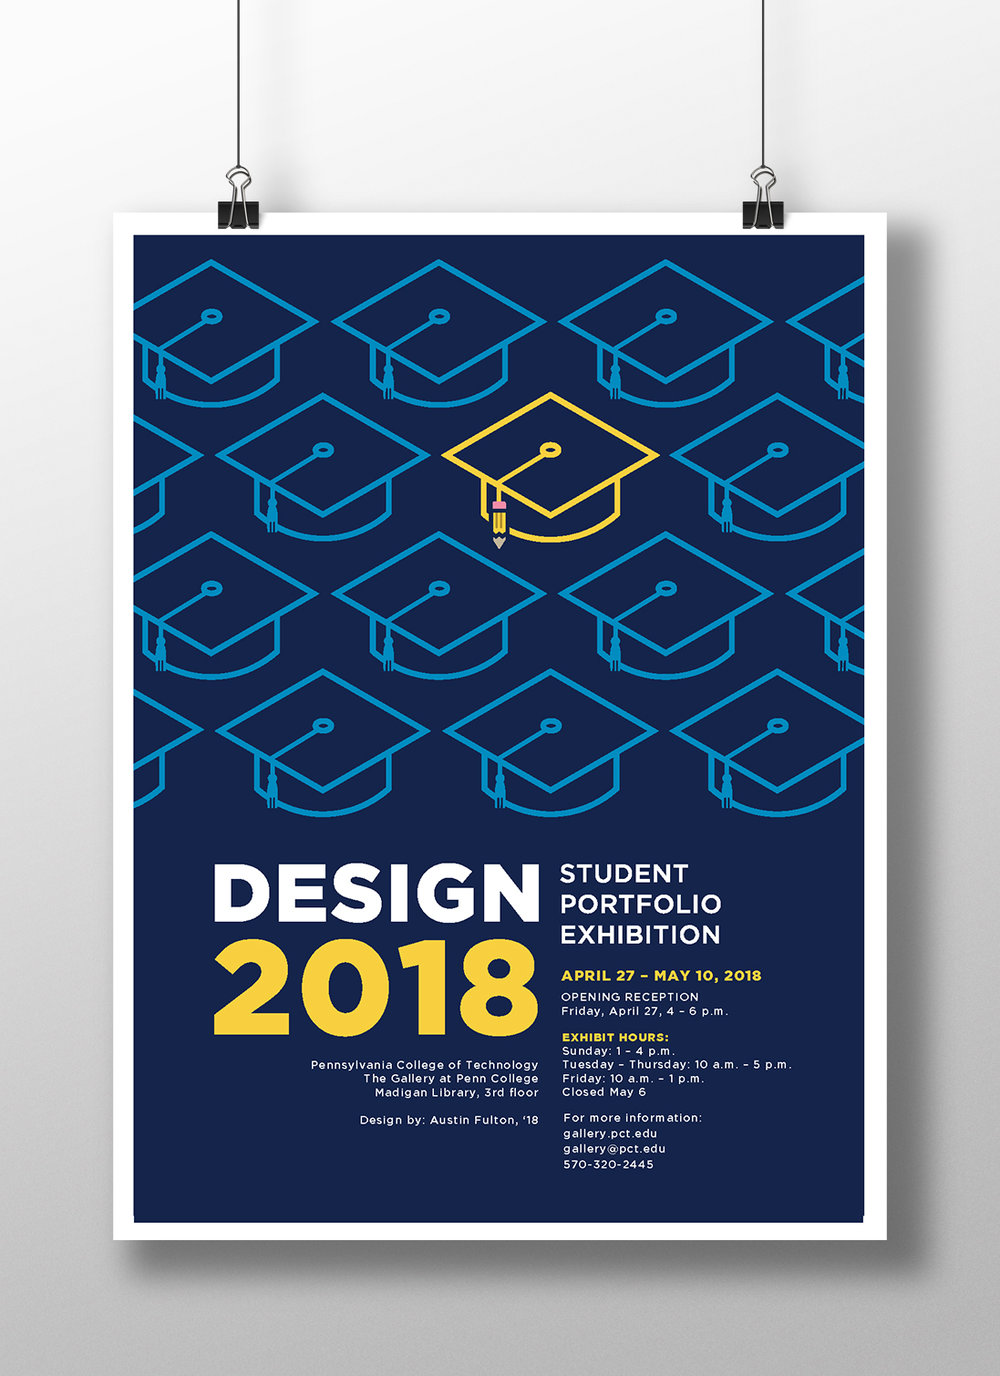 Design 2018 Exhibition AUSTIN FULTON